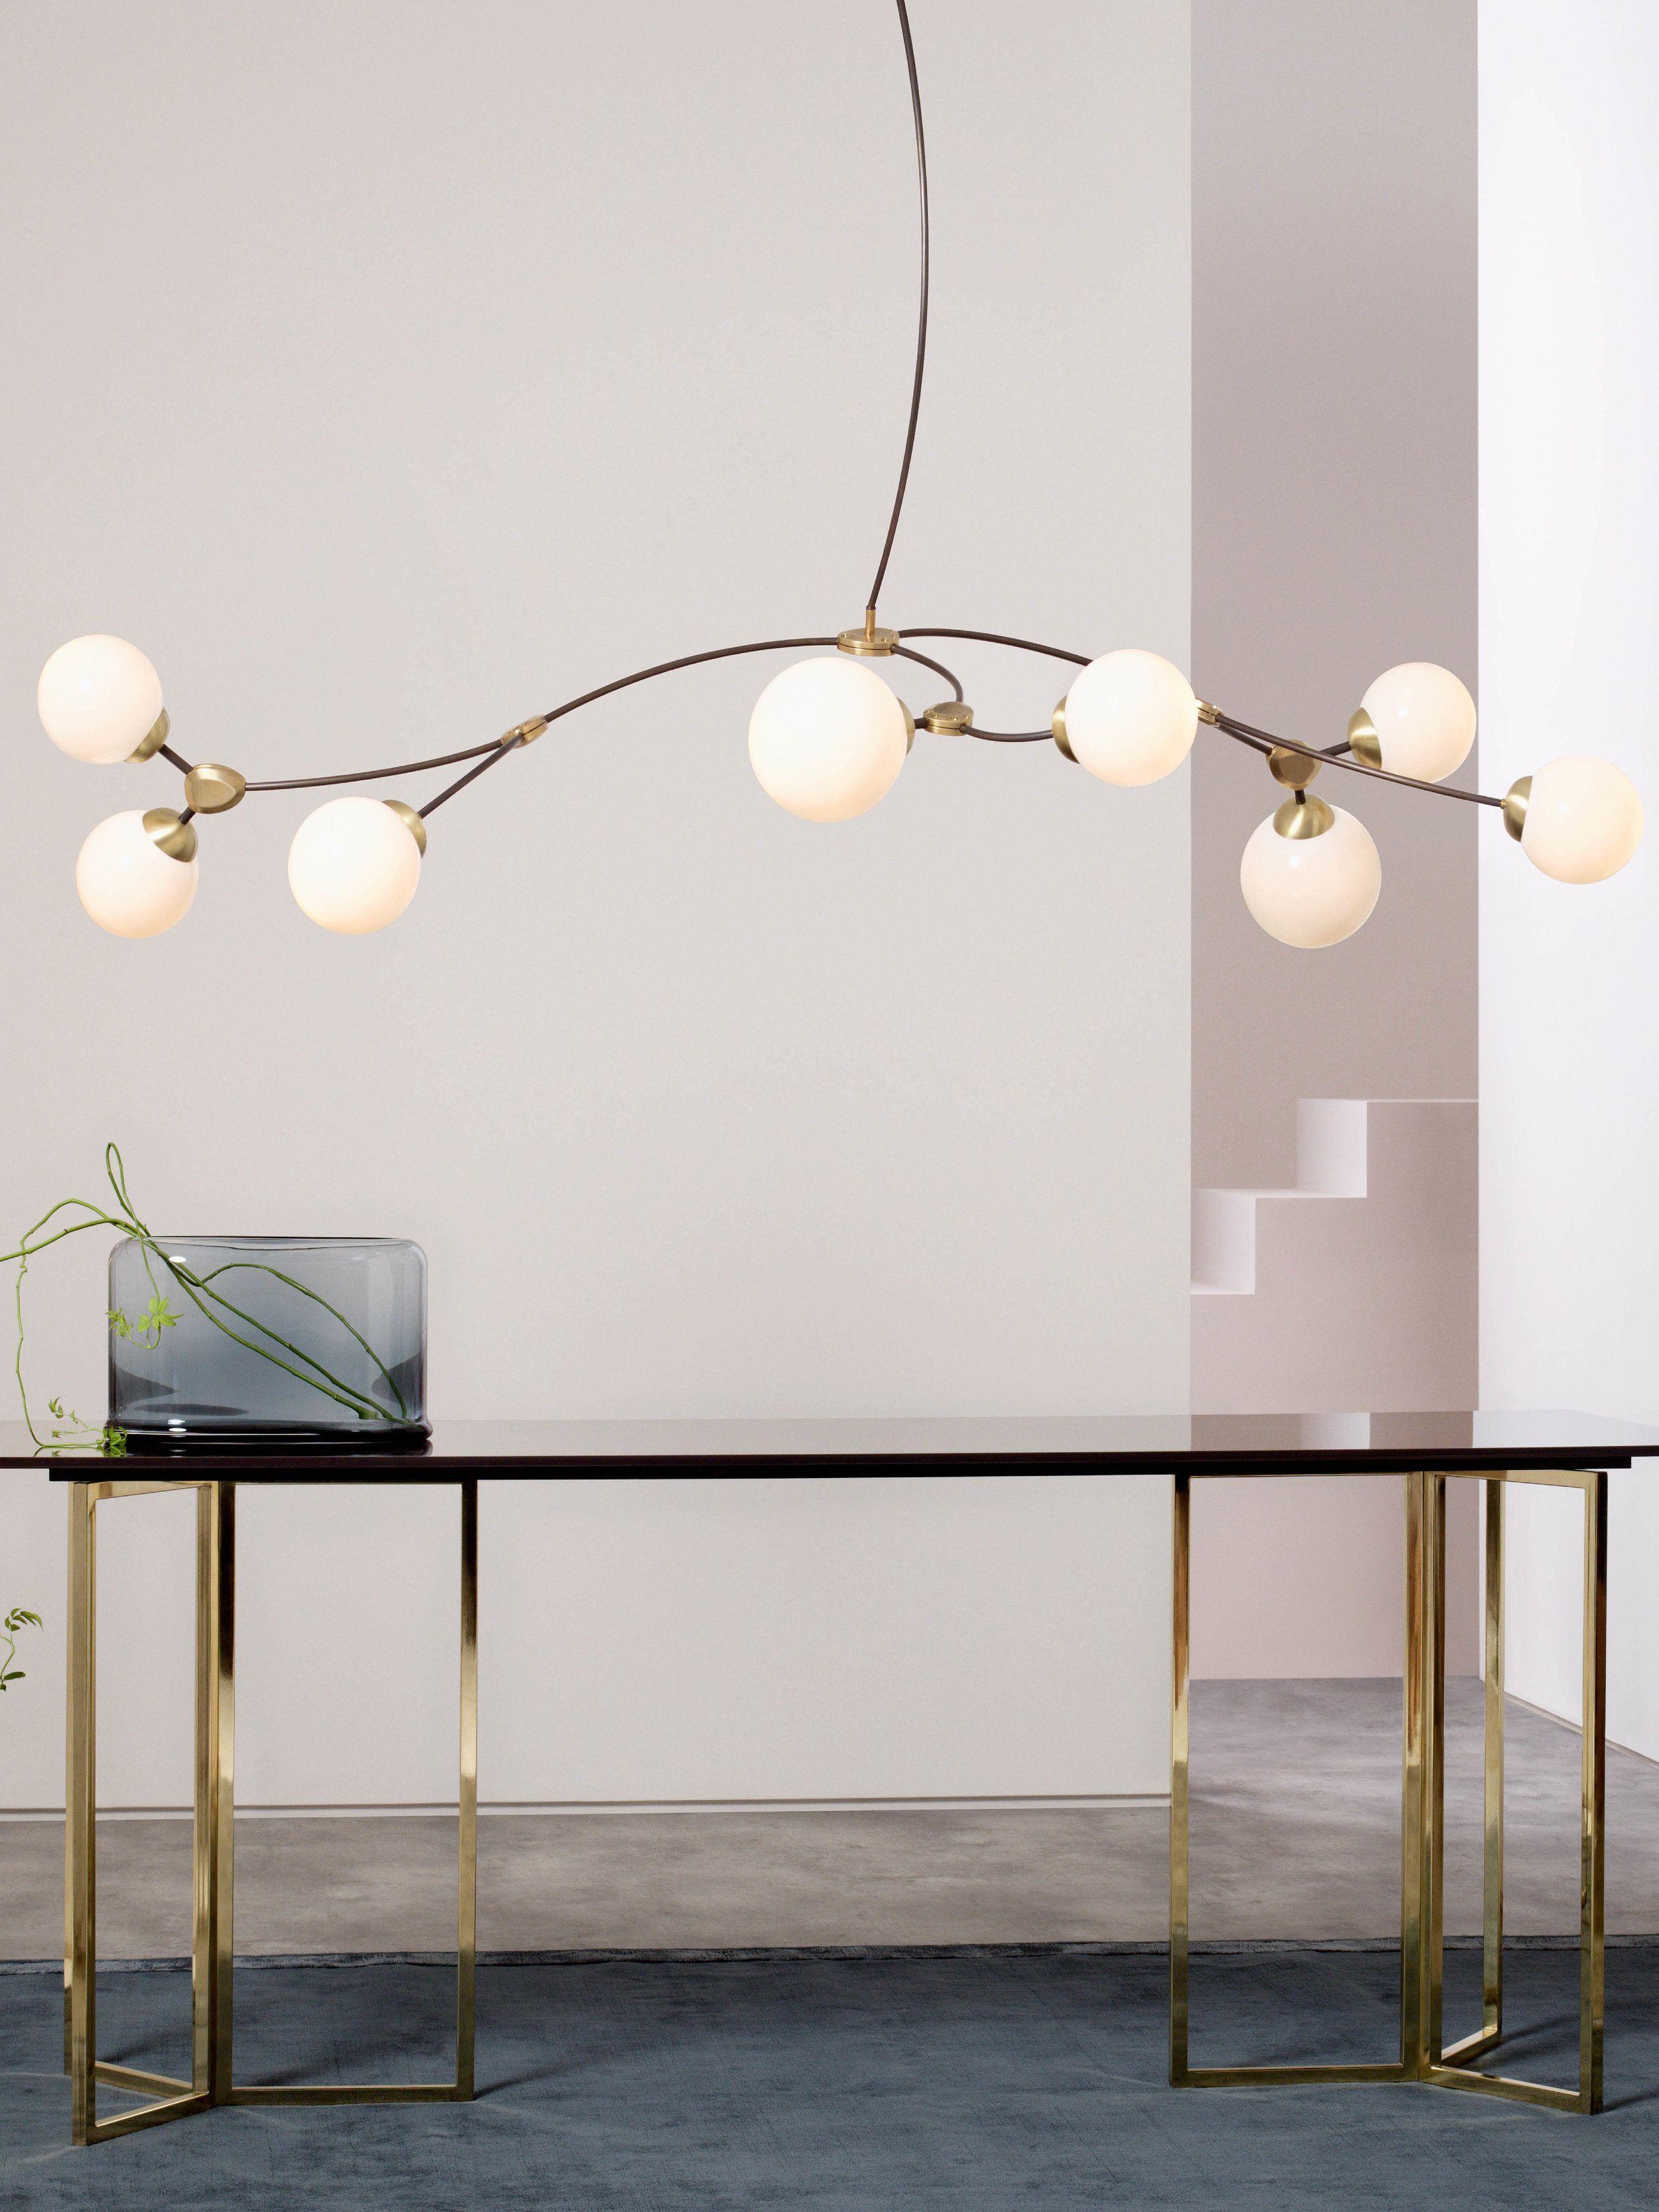 Ivy Pendant 8 Interior Lighting Lamp Room Lights